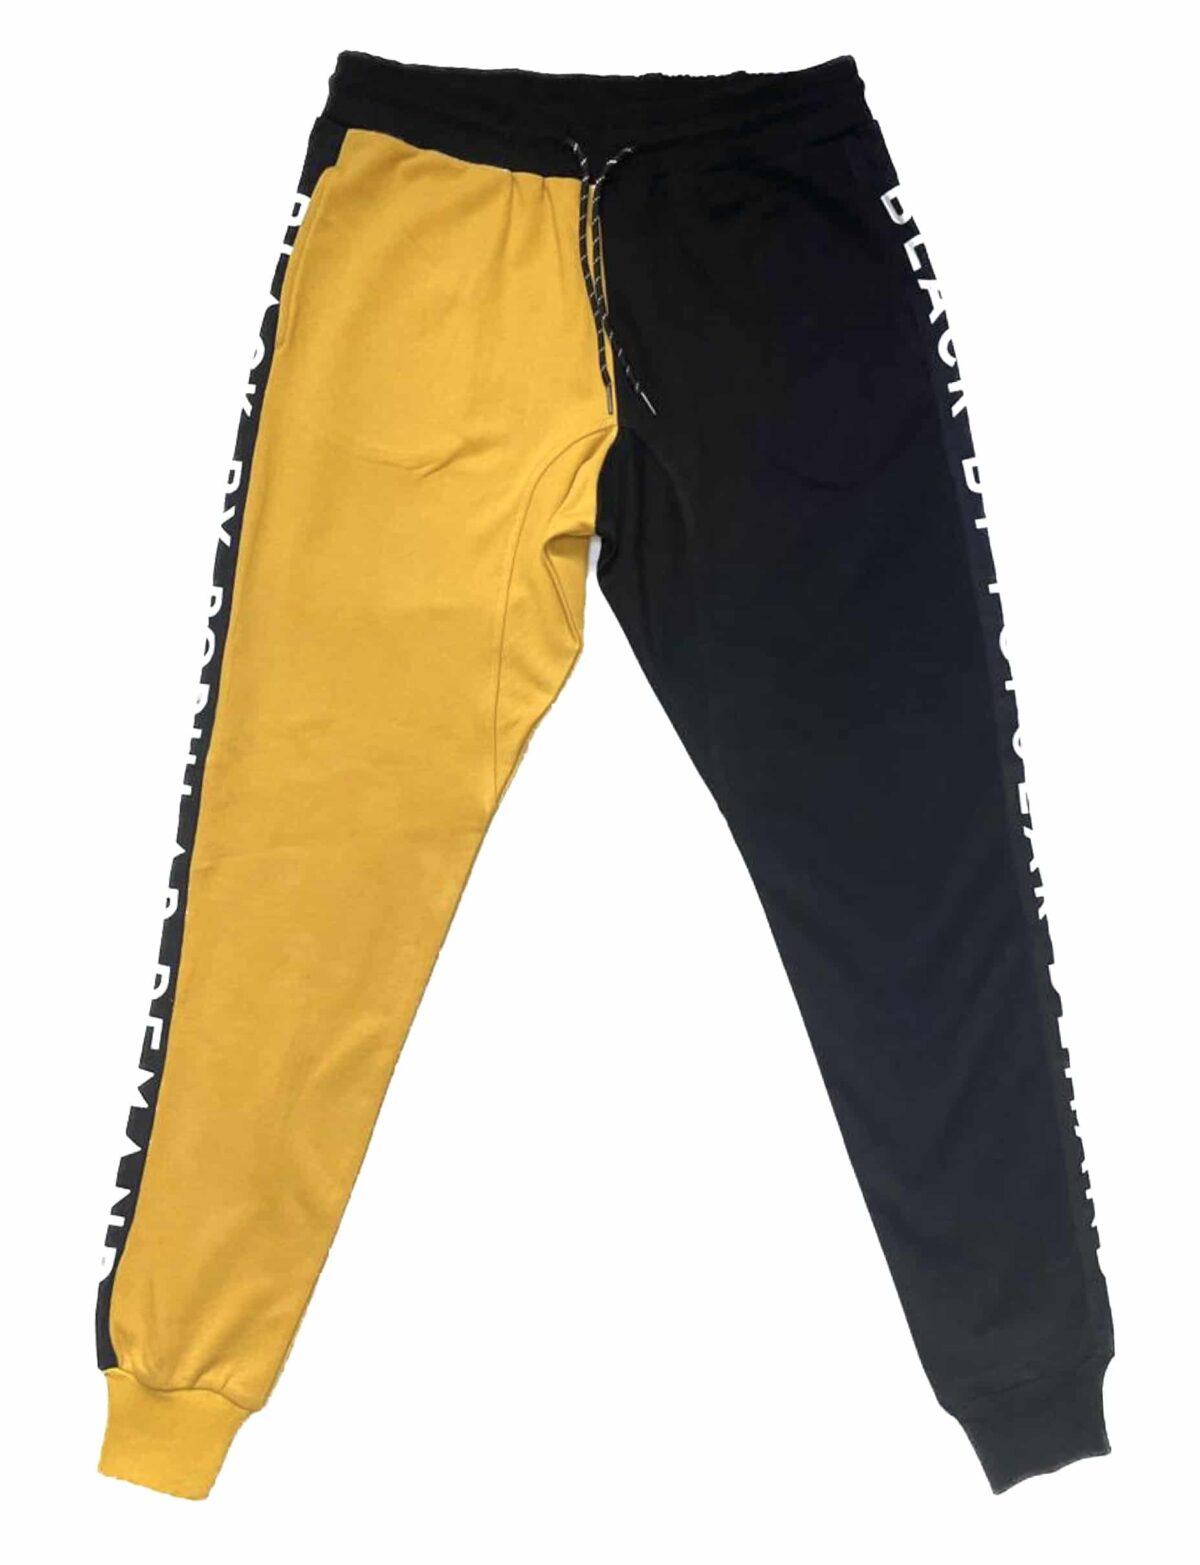 Black by Popular Demand® Unisex Black & Yellow Jogger Sweatpants HGC Apparel